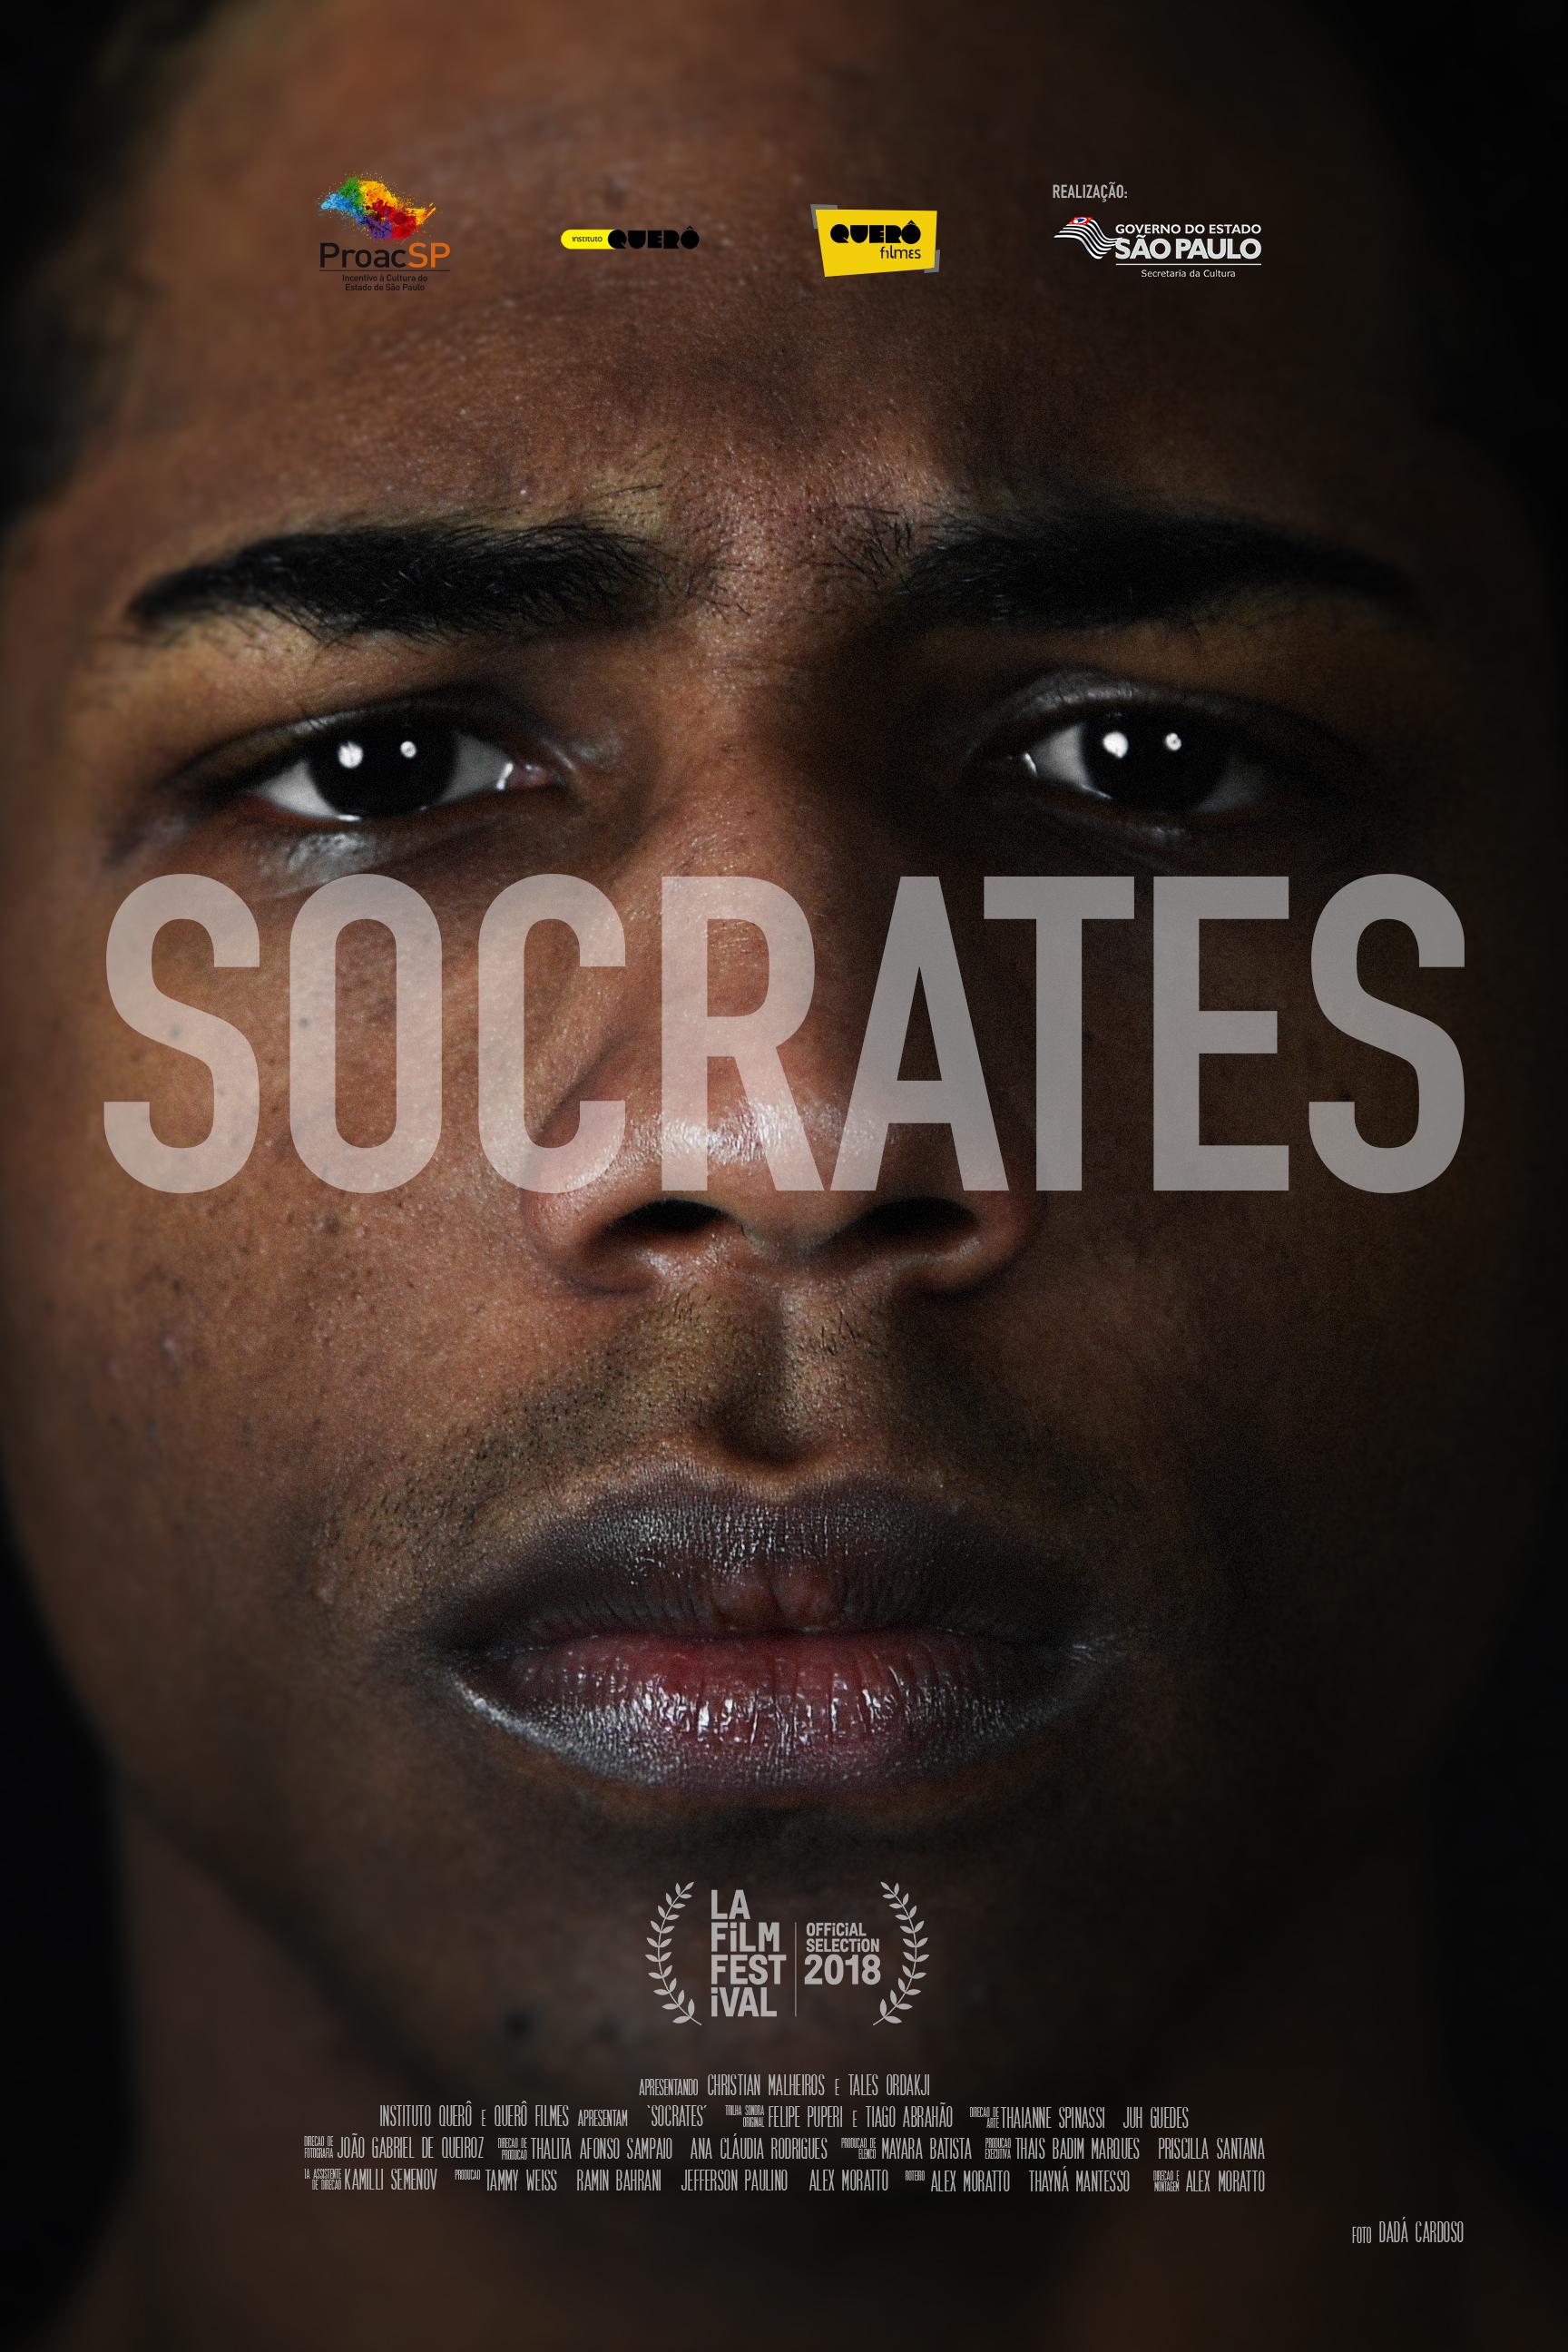 socrates_002.jpg